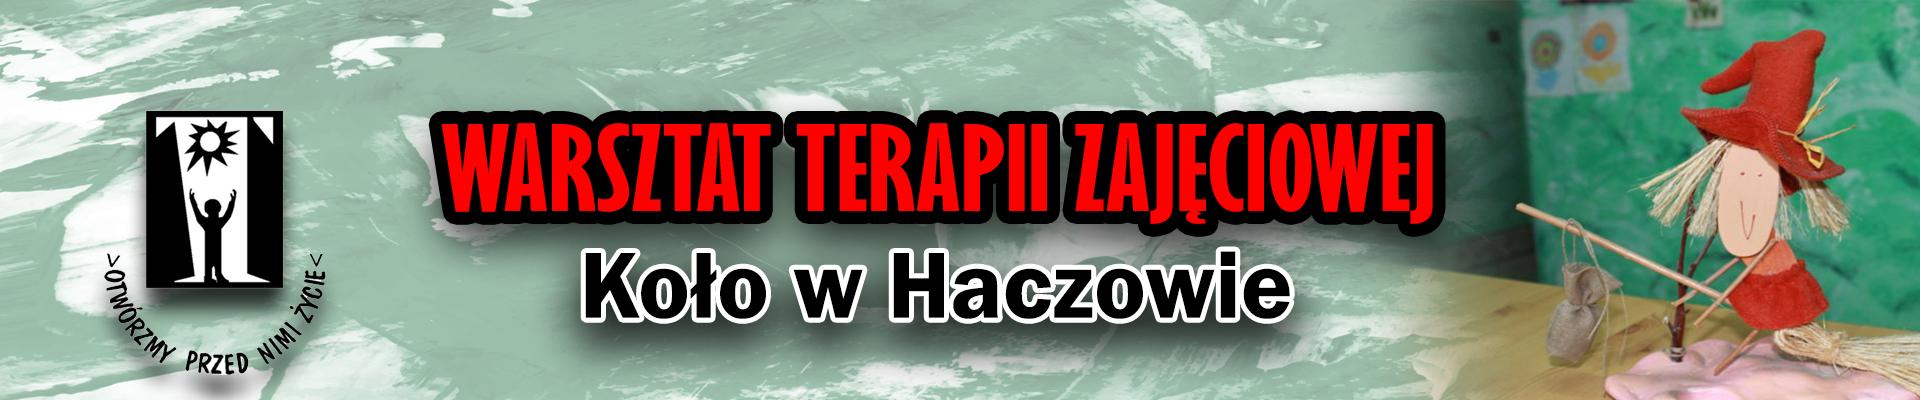 "XIV Podkarpacki Festiwal Rekreacji i Zabawy ""Pożegnanie Lata"""